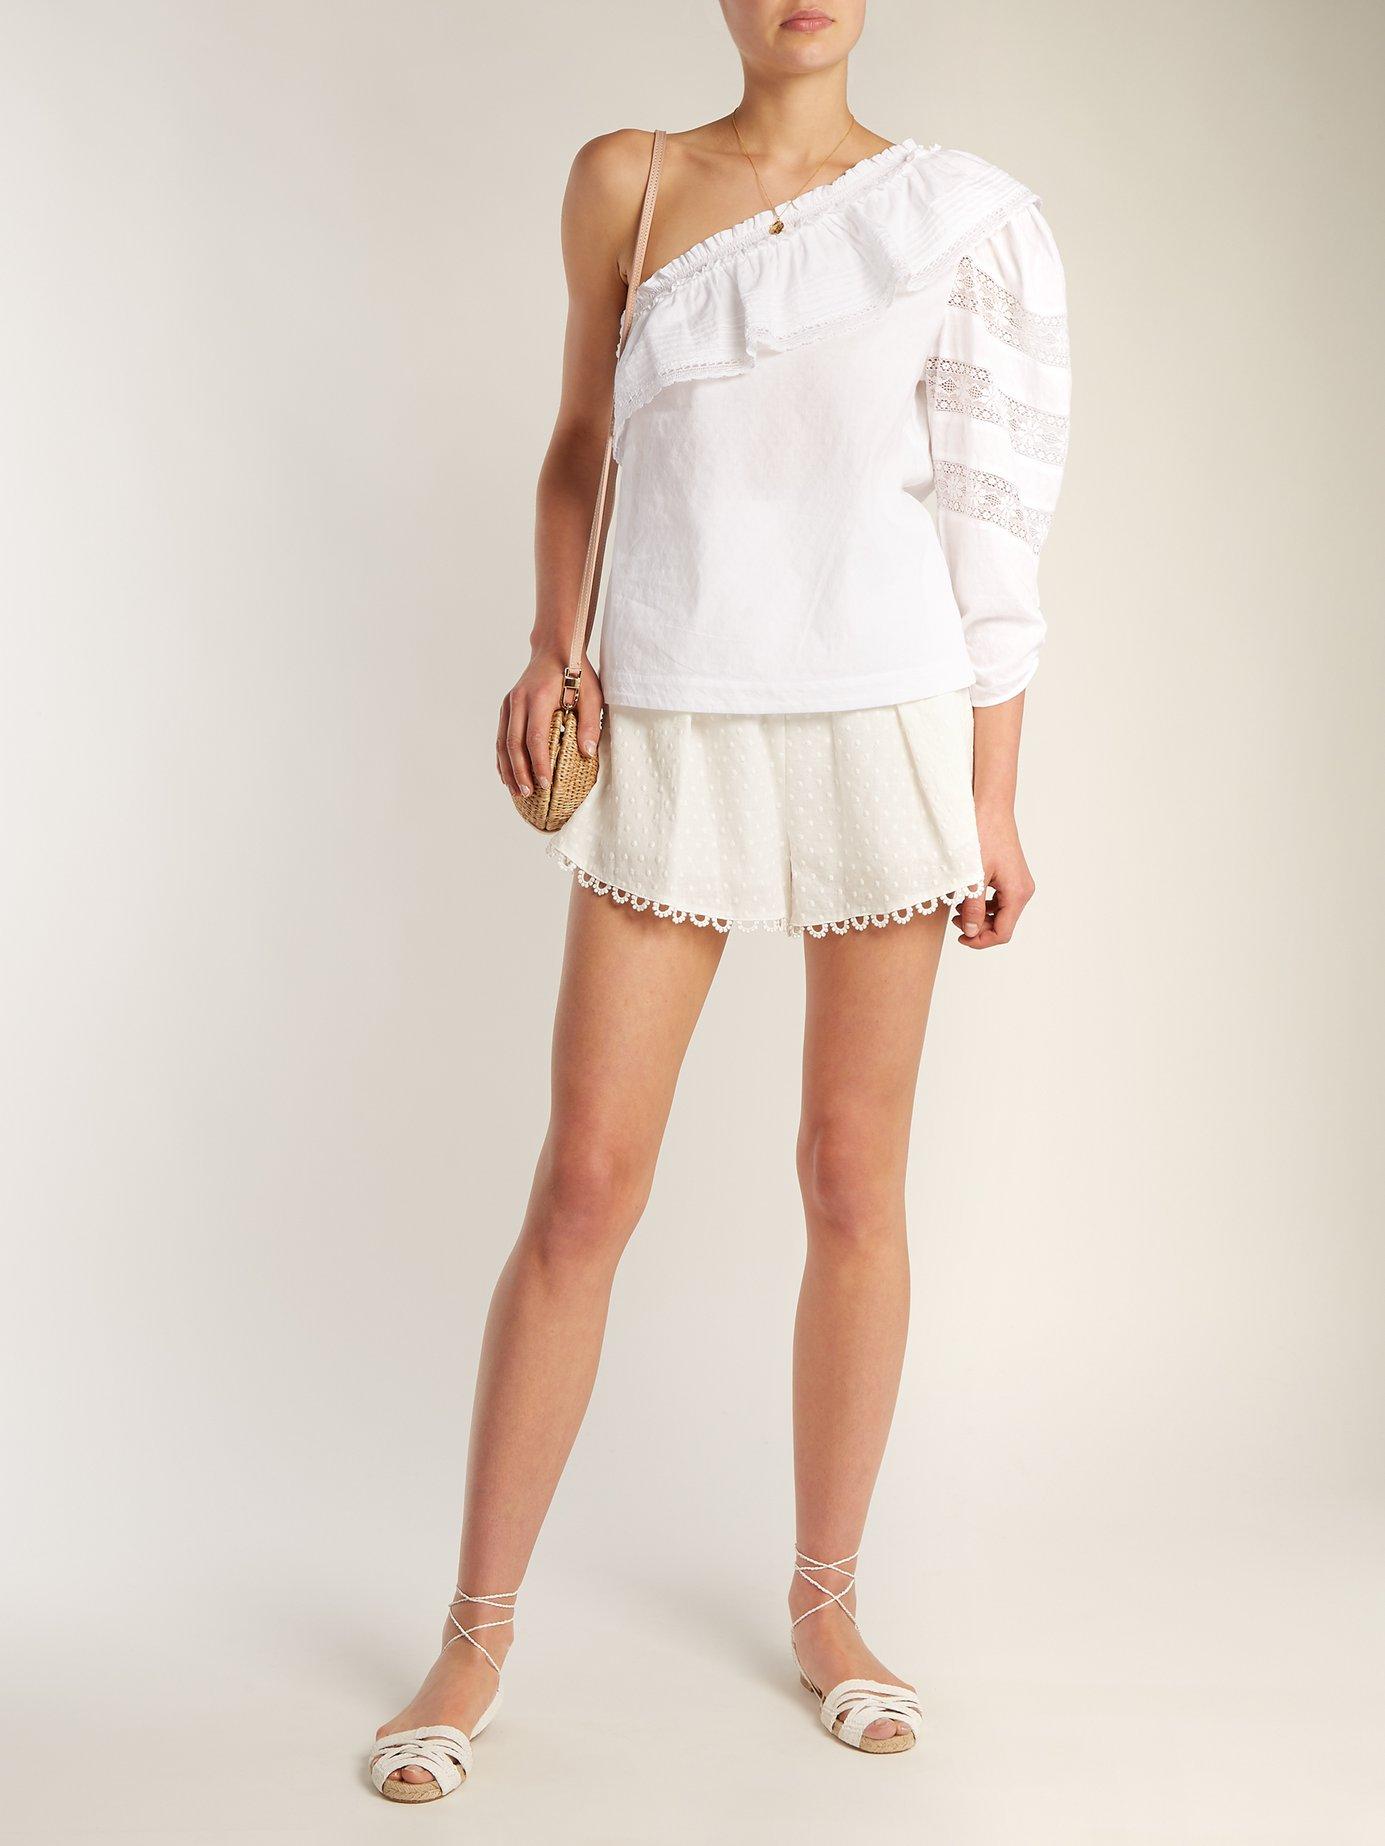 Asymmetric ruffle-trimmed cotton blouse by Sea